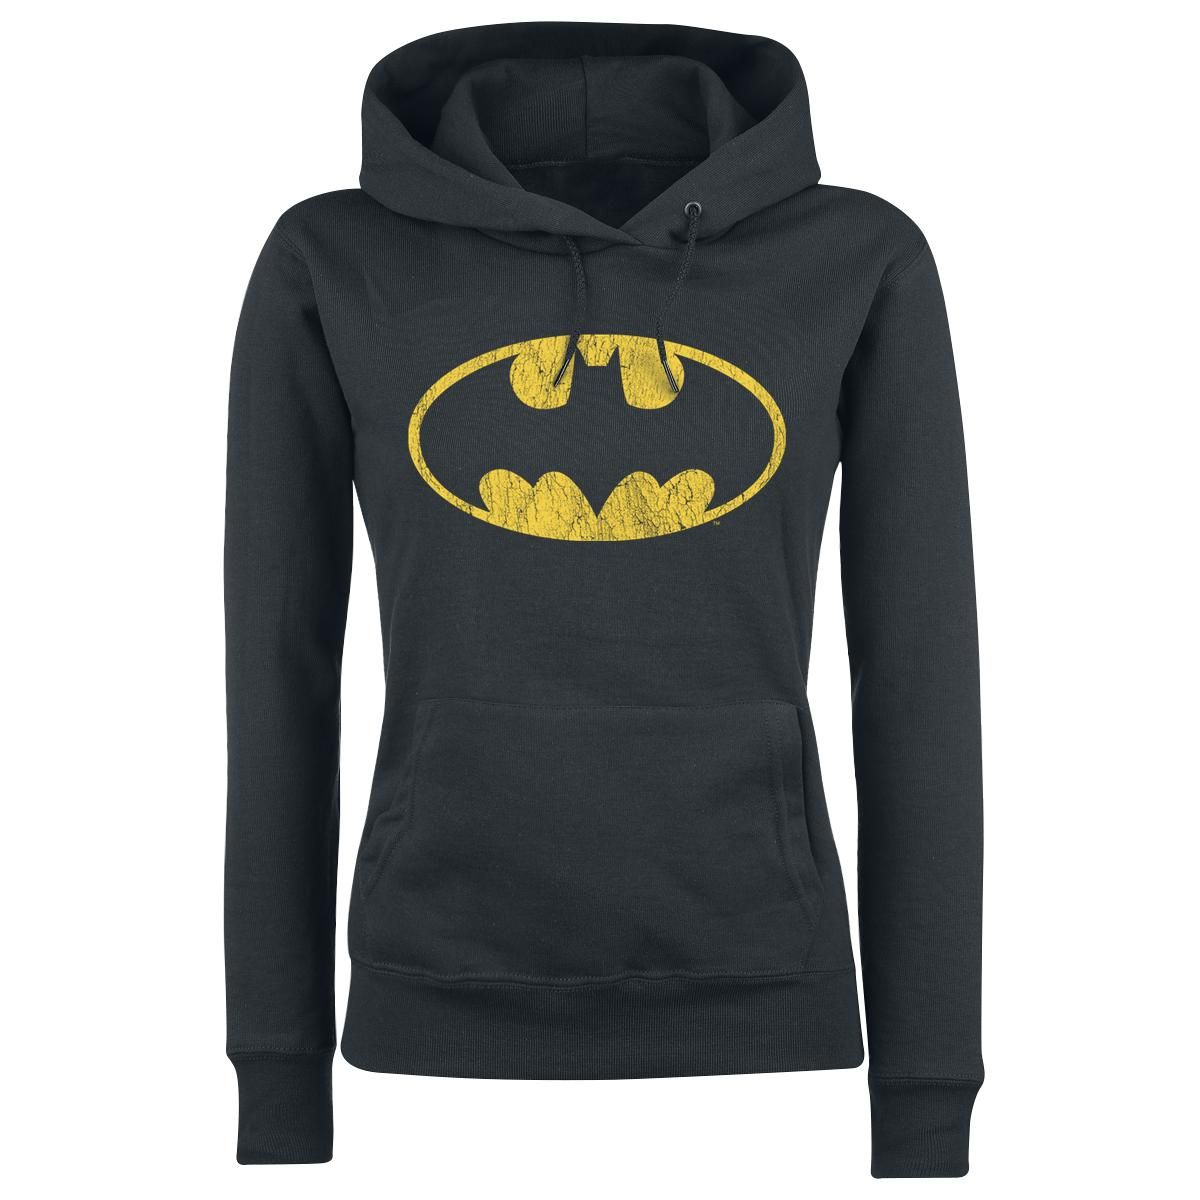 Batmanhuppari! Tahdon!